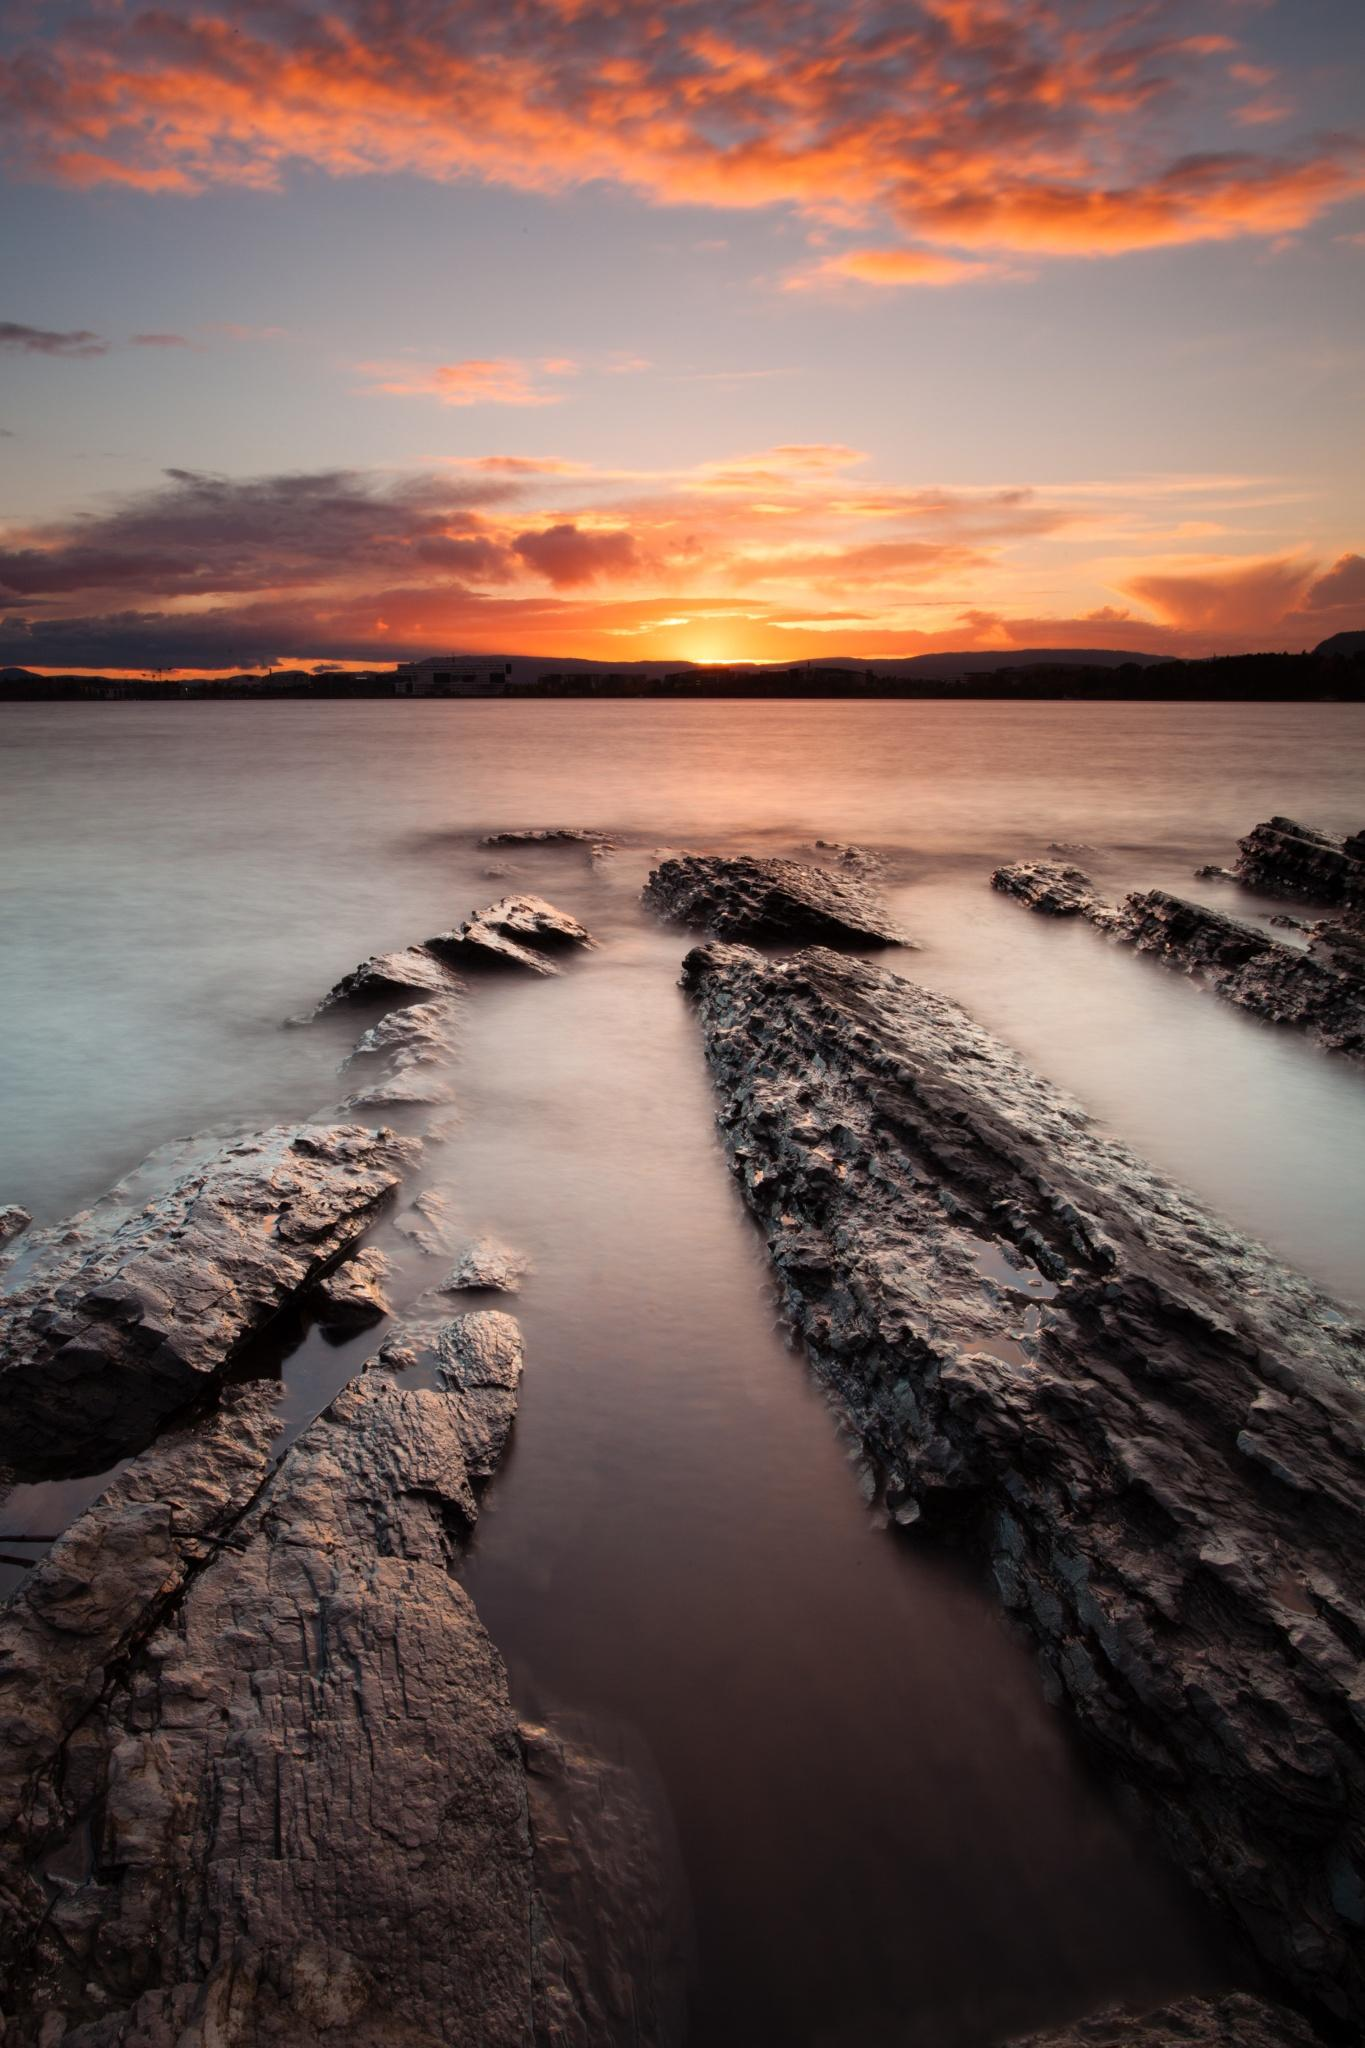 sunset stone clouds ocean wallpaper